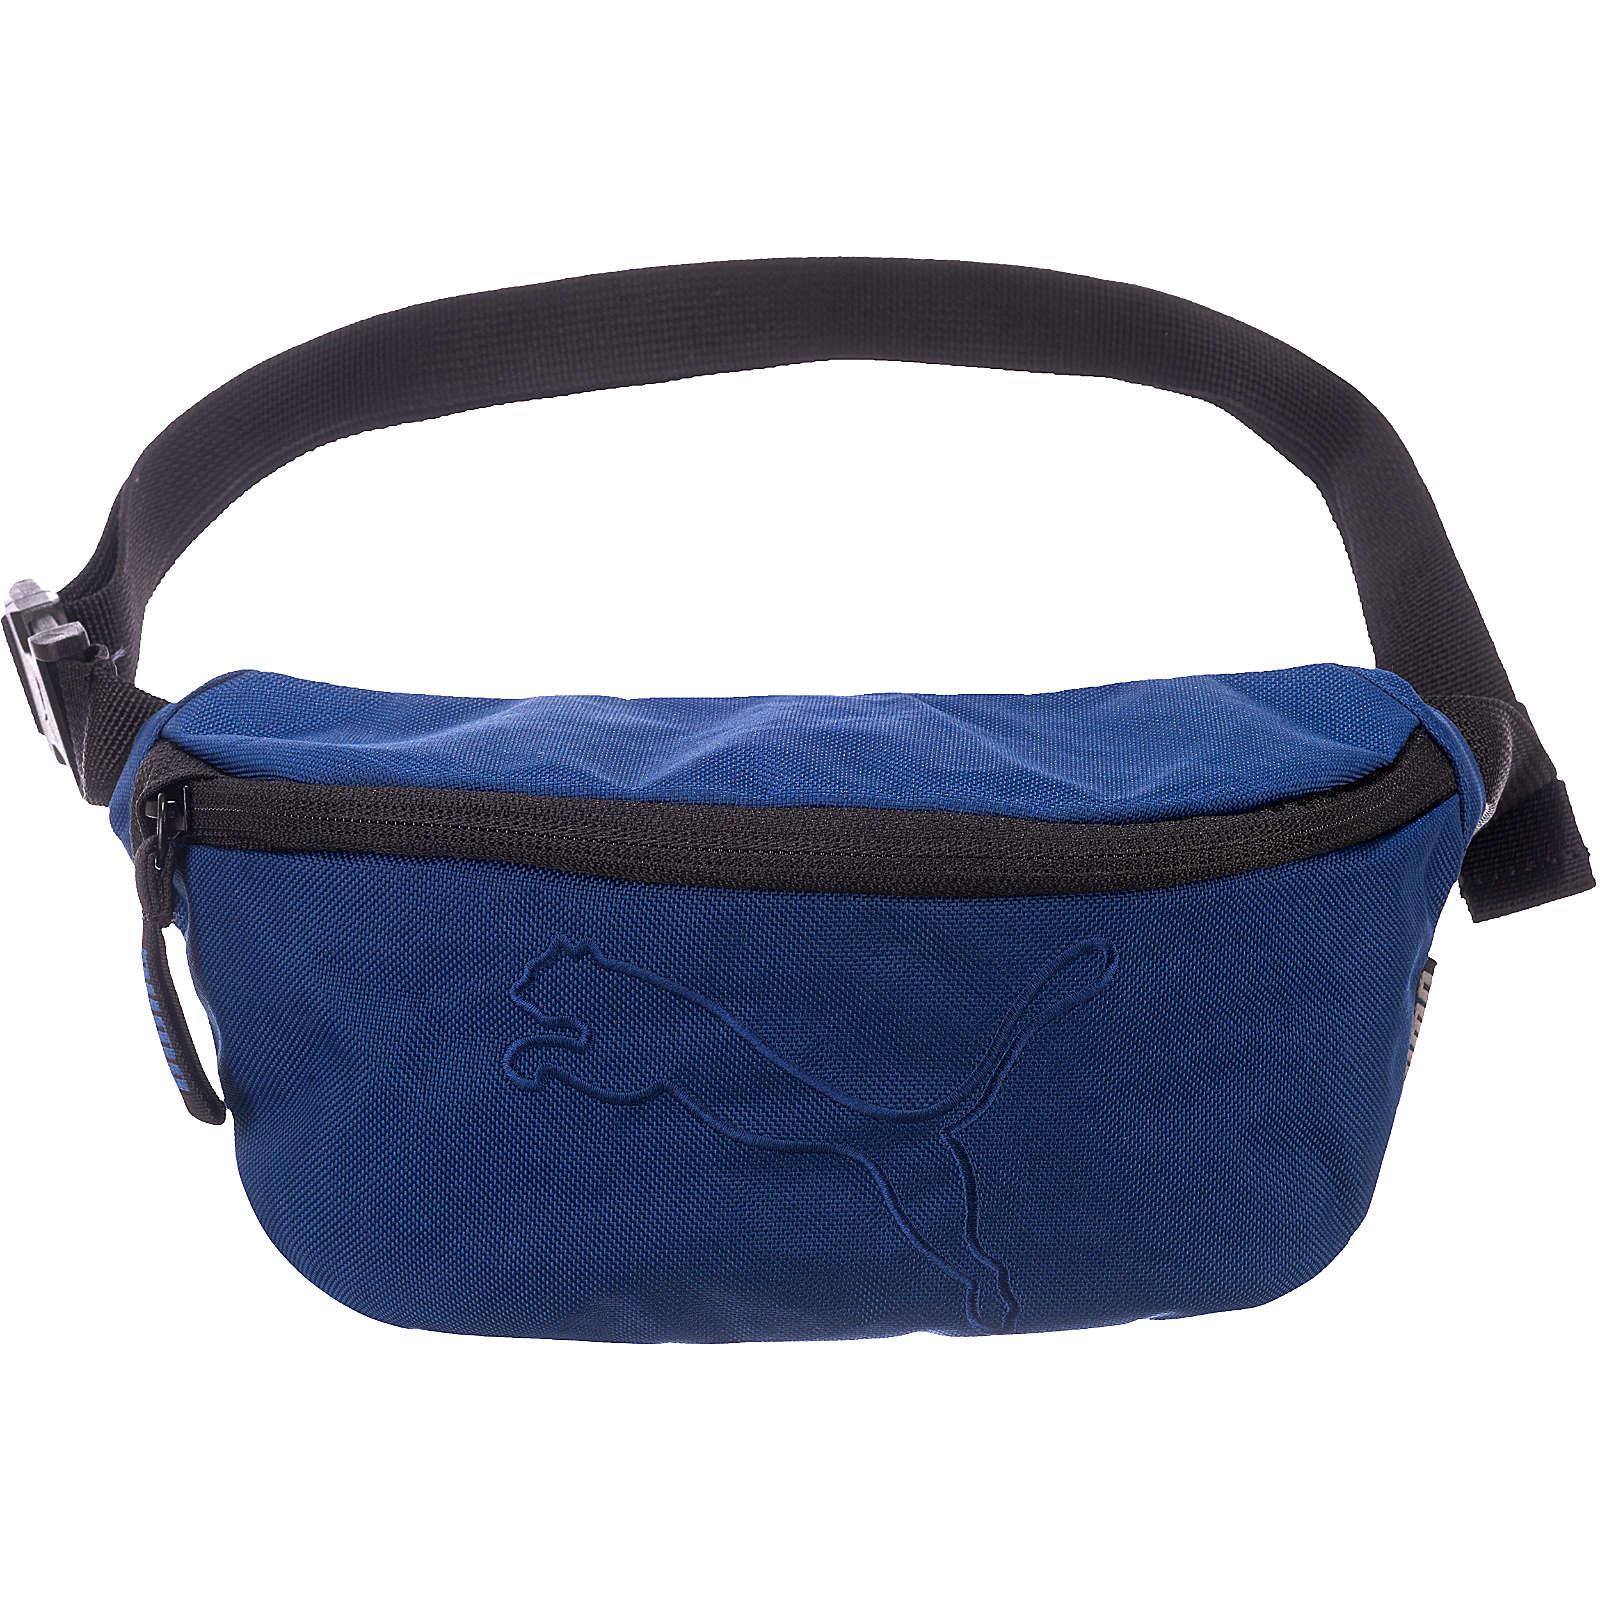 PUMA Buzz Hüfttasche blau